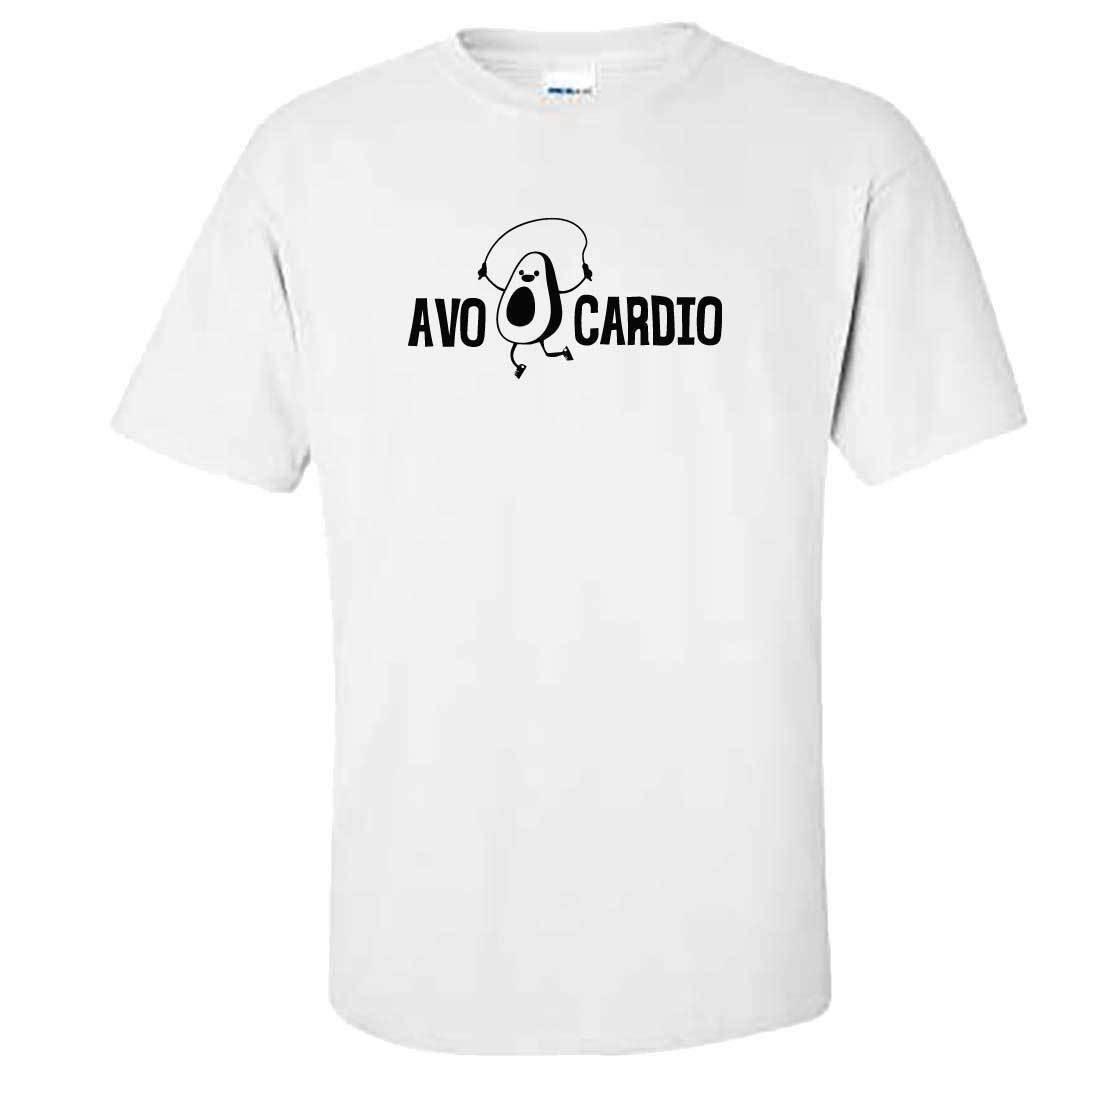 Avo Cardio T Shirt Top Funny Tumblr Avocado Cardio Gym Fitness